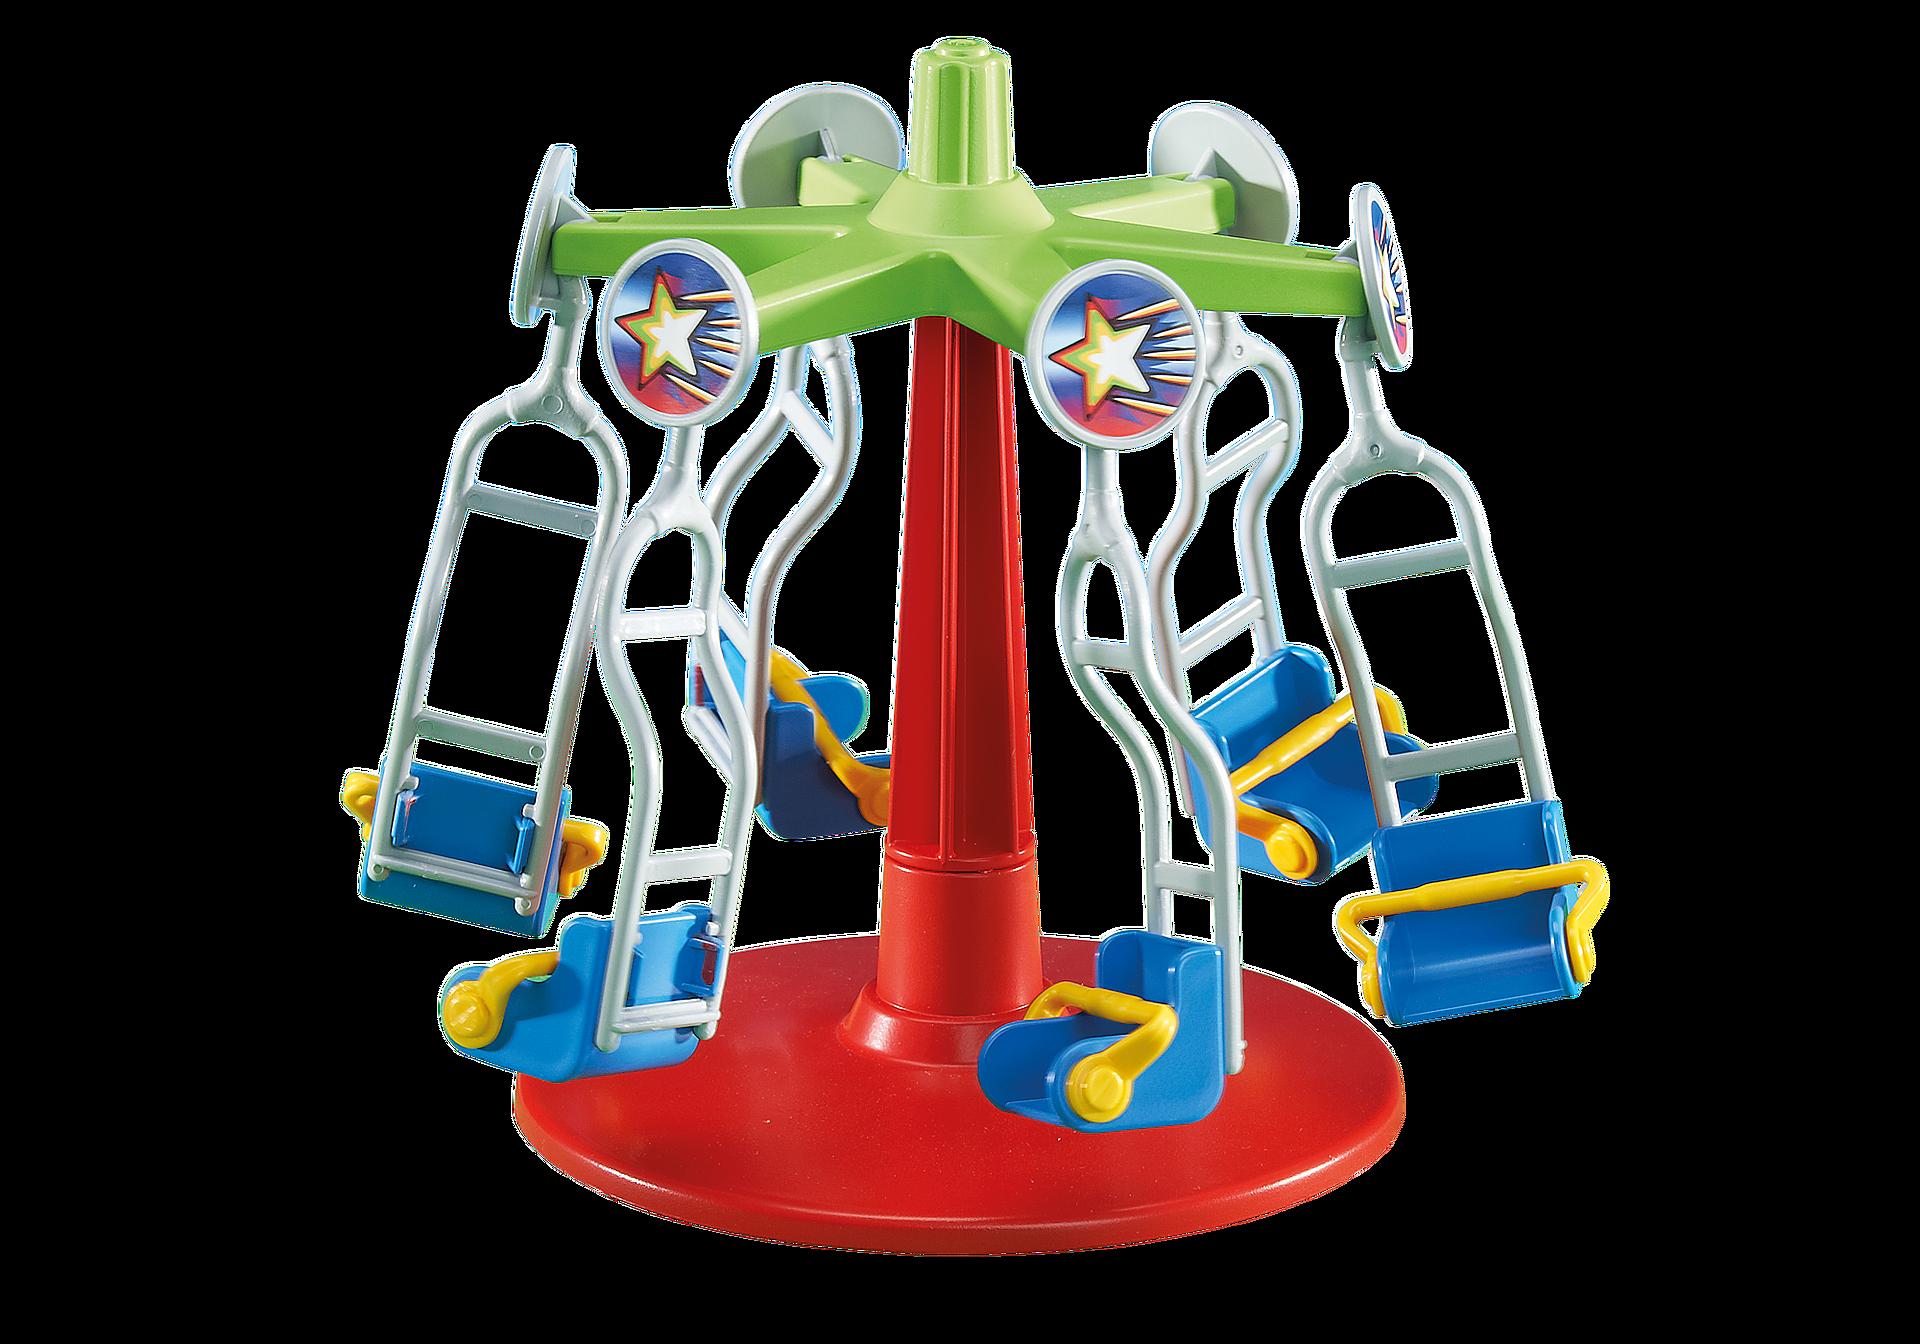 6440 Attraction de chaises volantes zoom image1